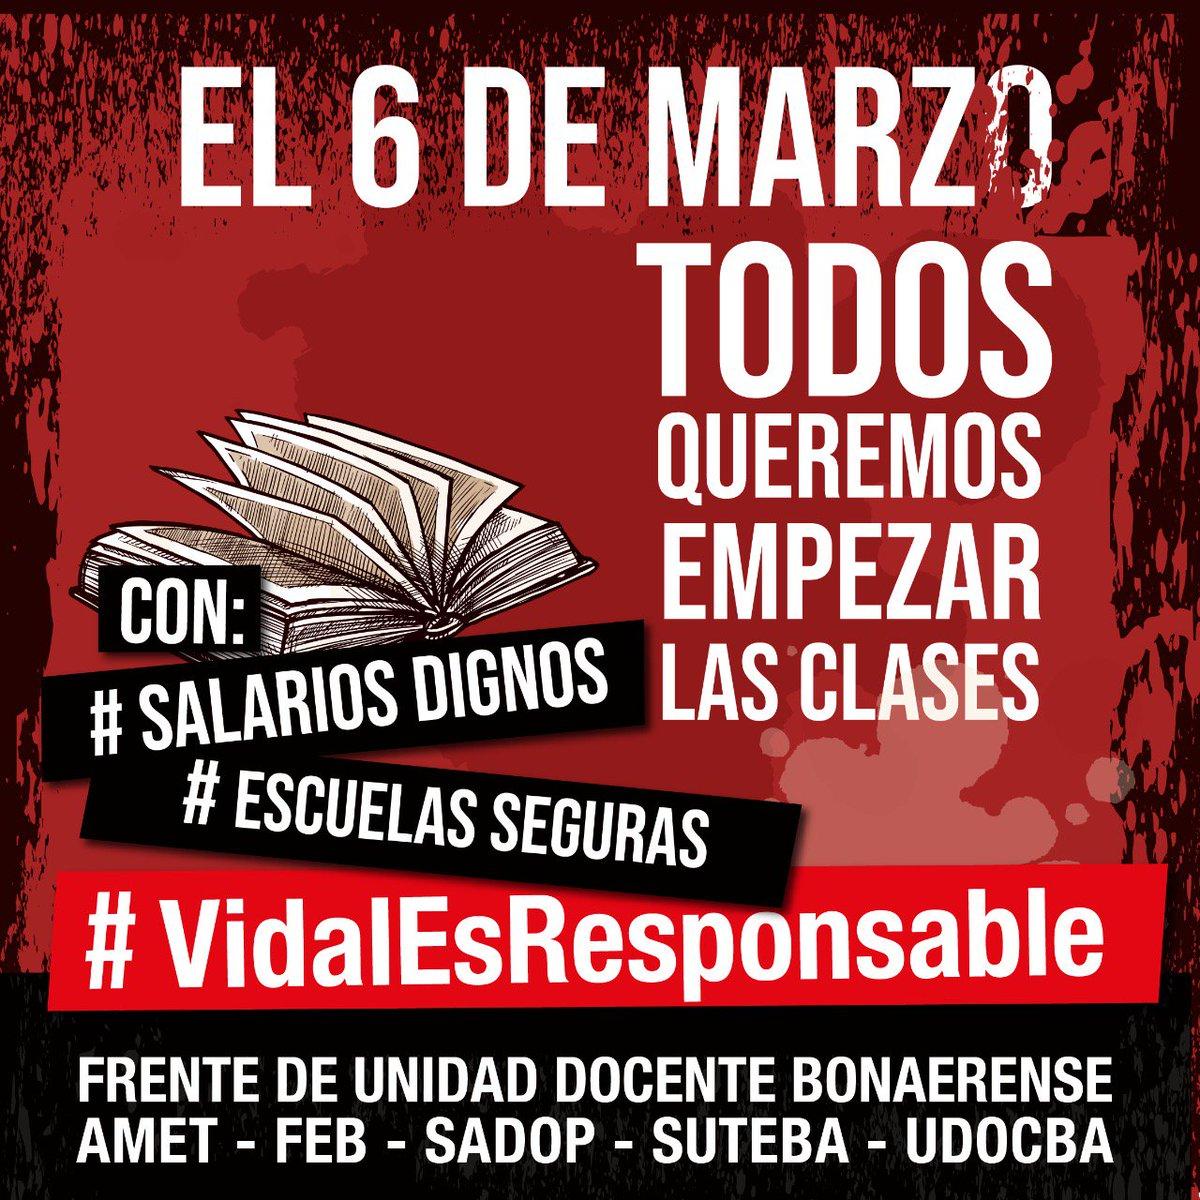 GustavoSantosi's photo on #VidalEsResponsable